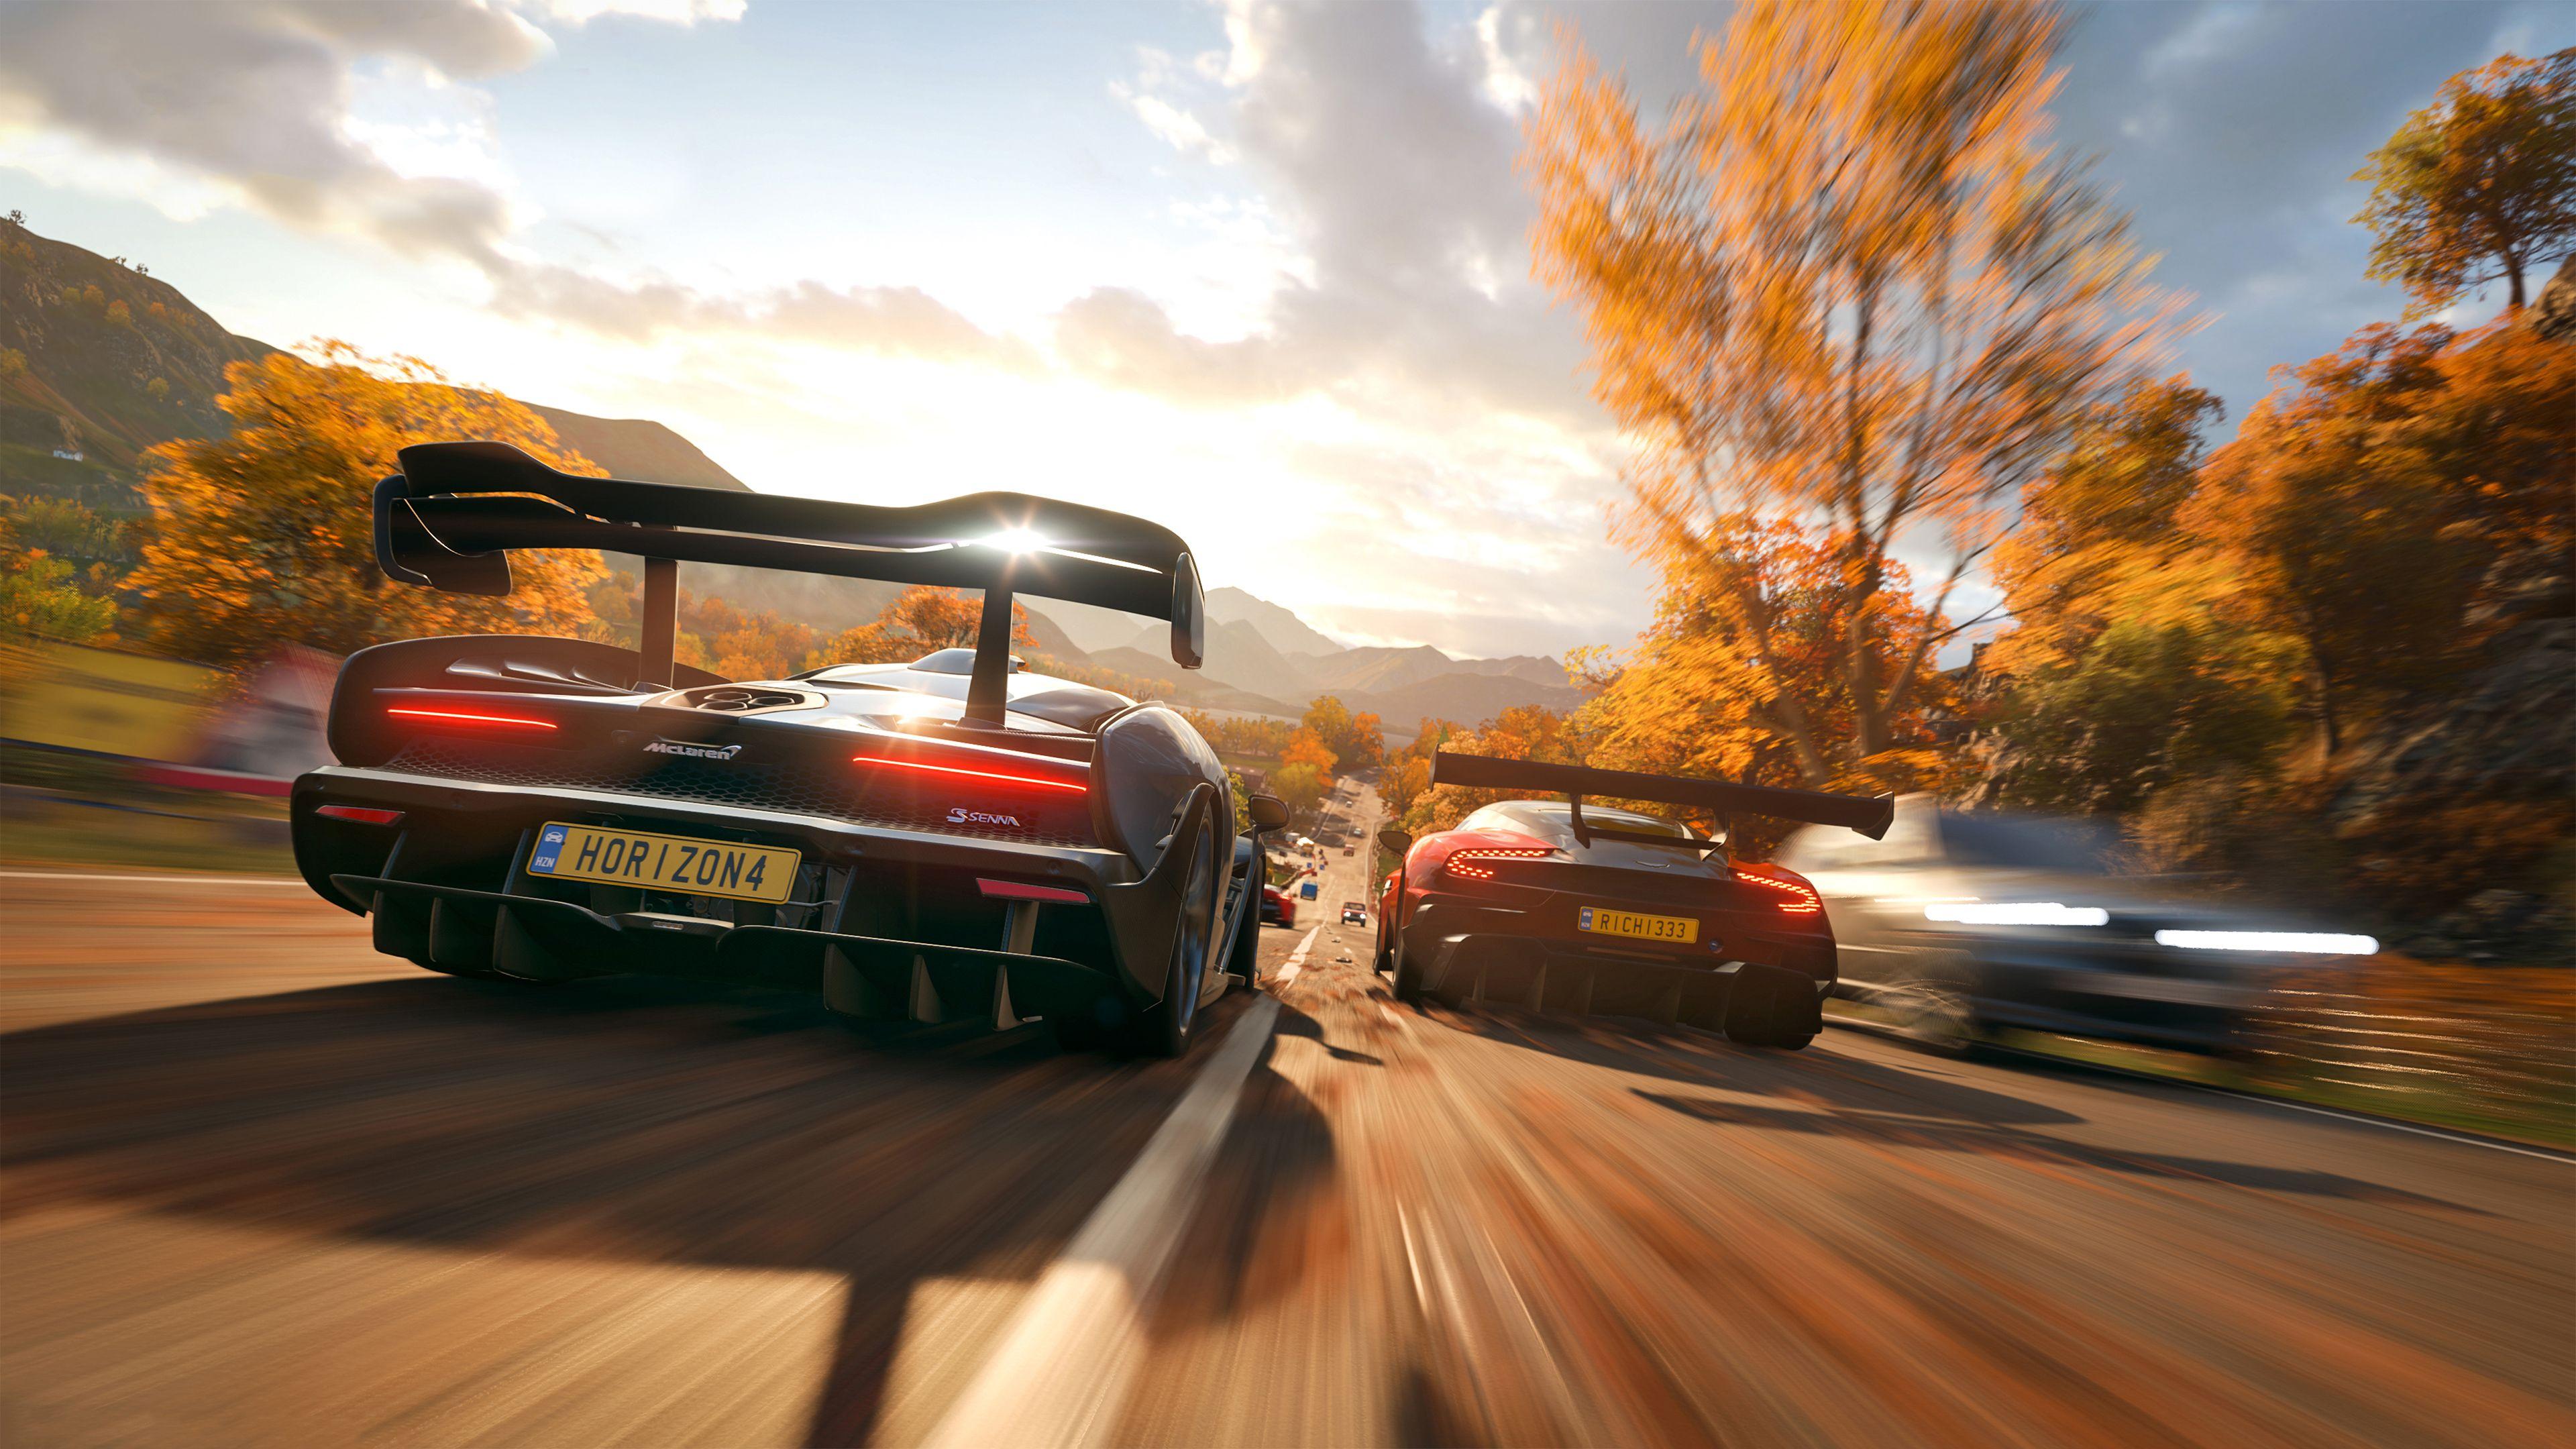 4k Forza Horizon 4 Hd Wallpapers Games Wallpapers Forza Wallpapers Forza Horizon 4 Wallpapers Cars Wallpapers Forza Horizon Forza Horizon 4 Forza Horizon 5